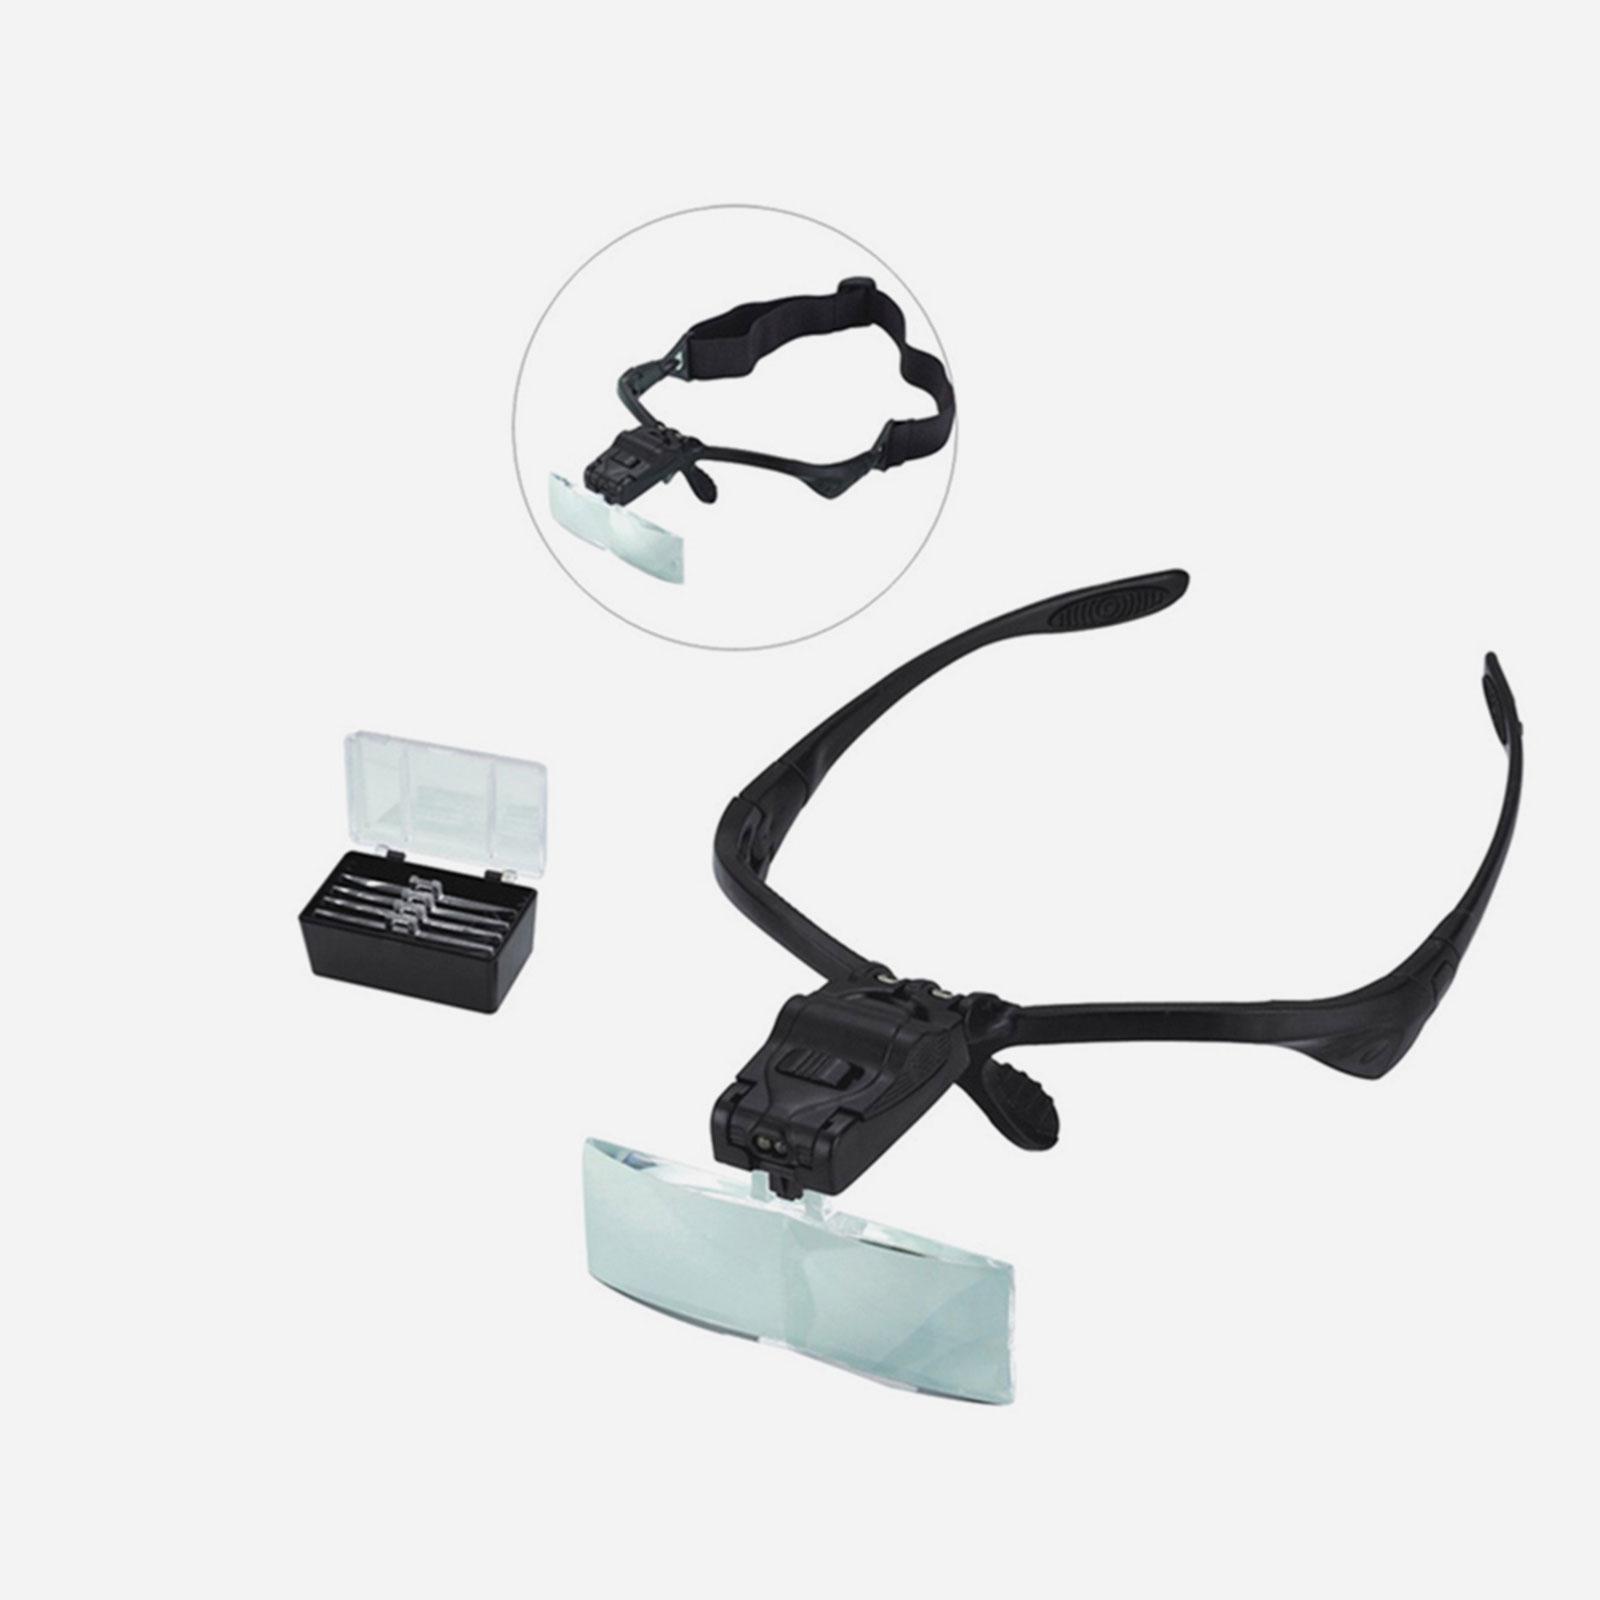 Лупа-очки с подсветкой